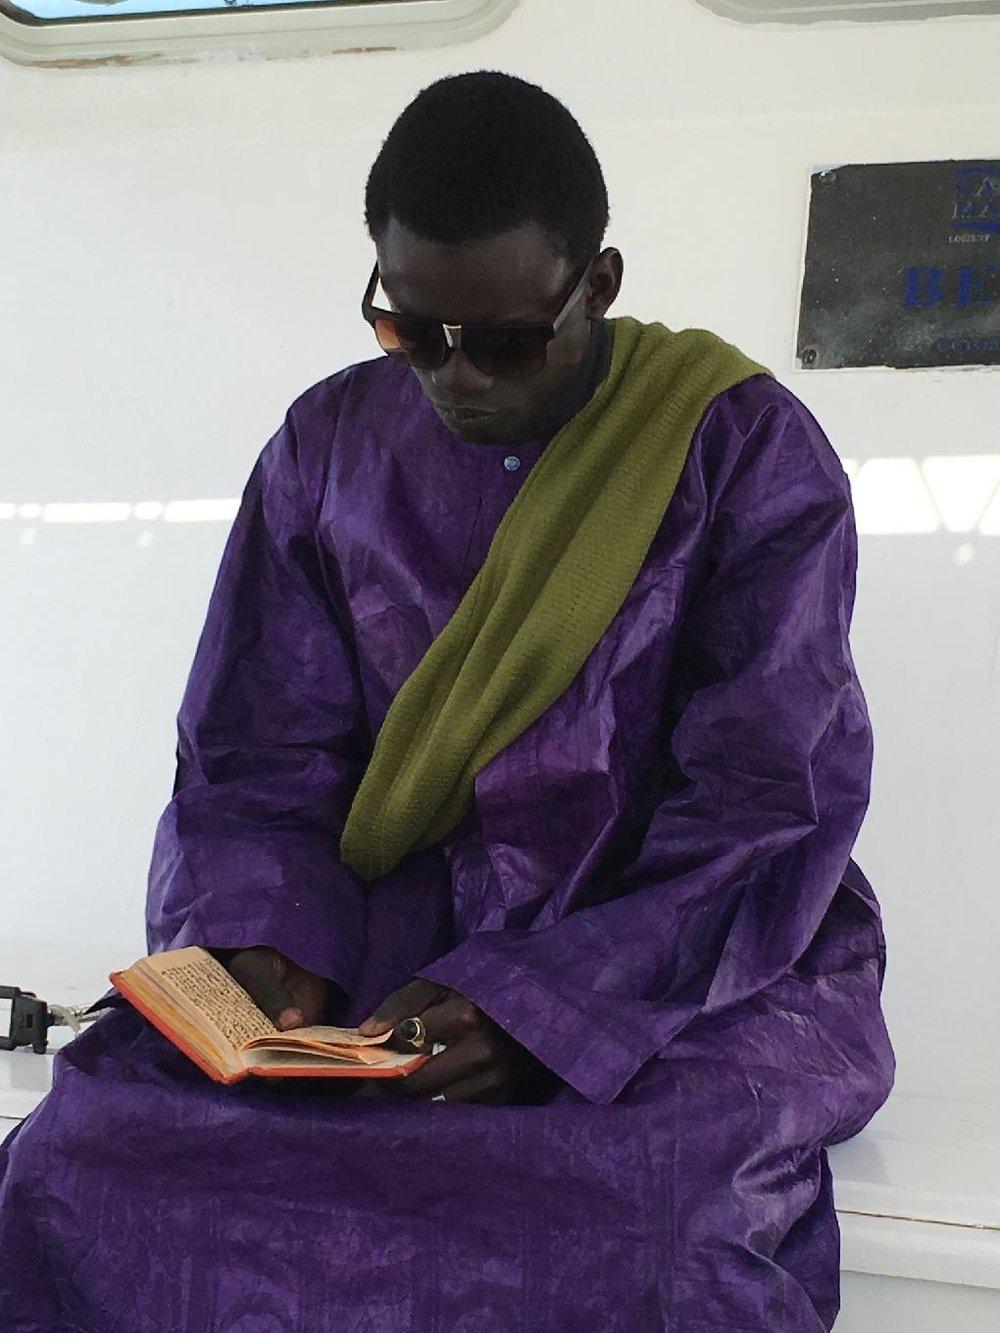 Barbara Lowenstein's Senegal